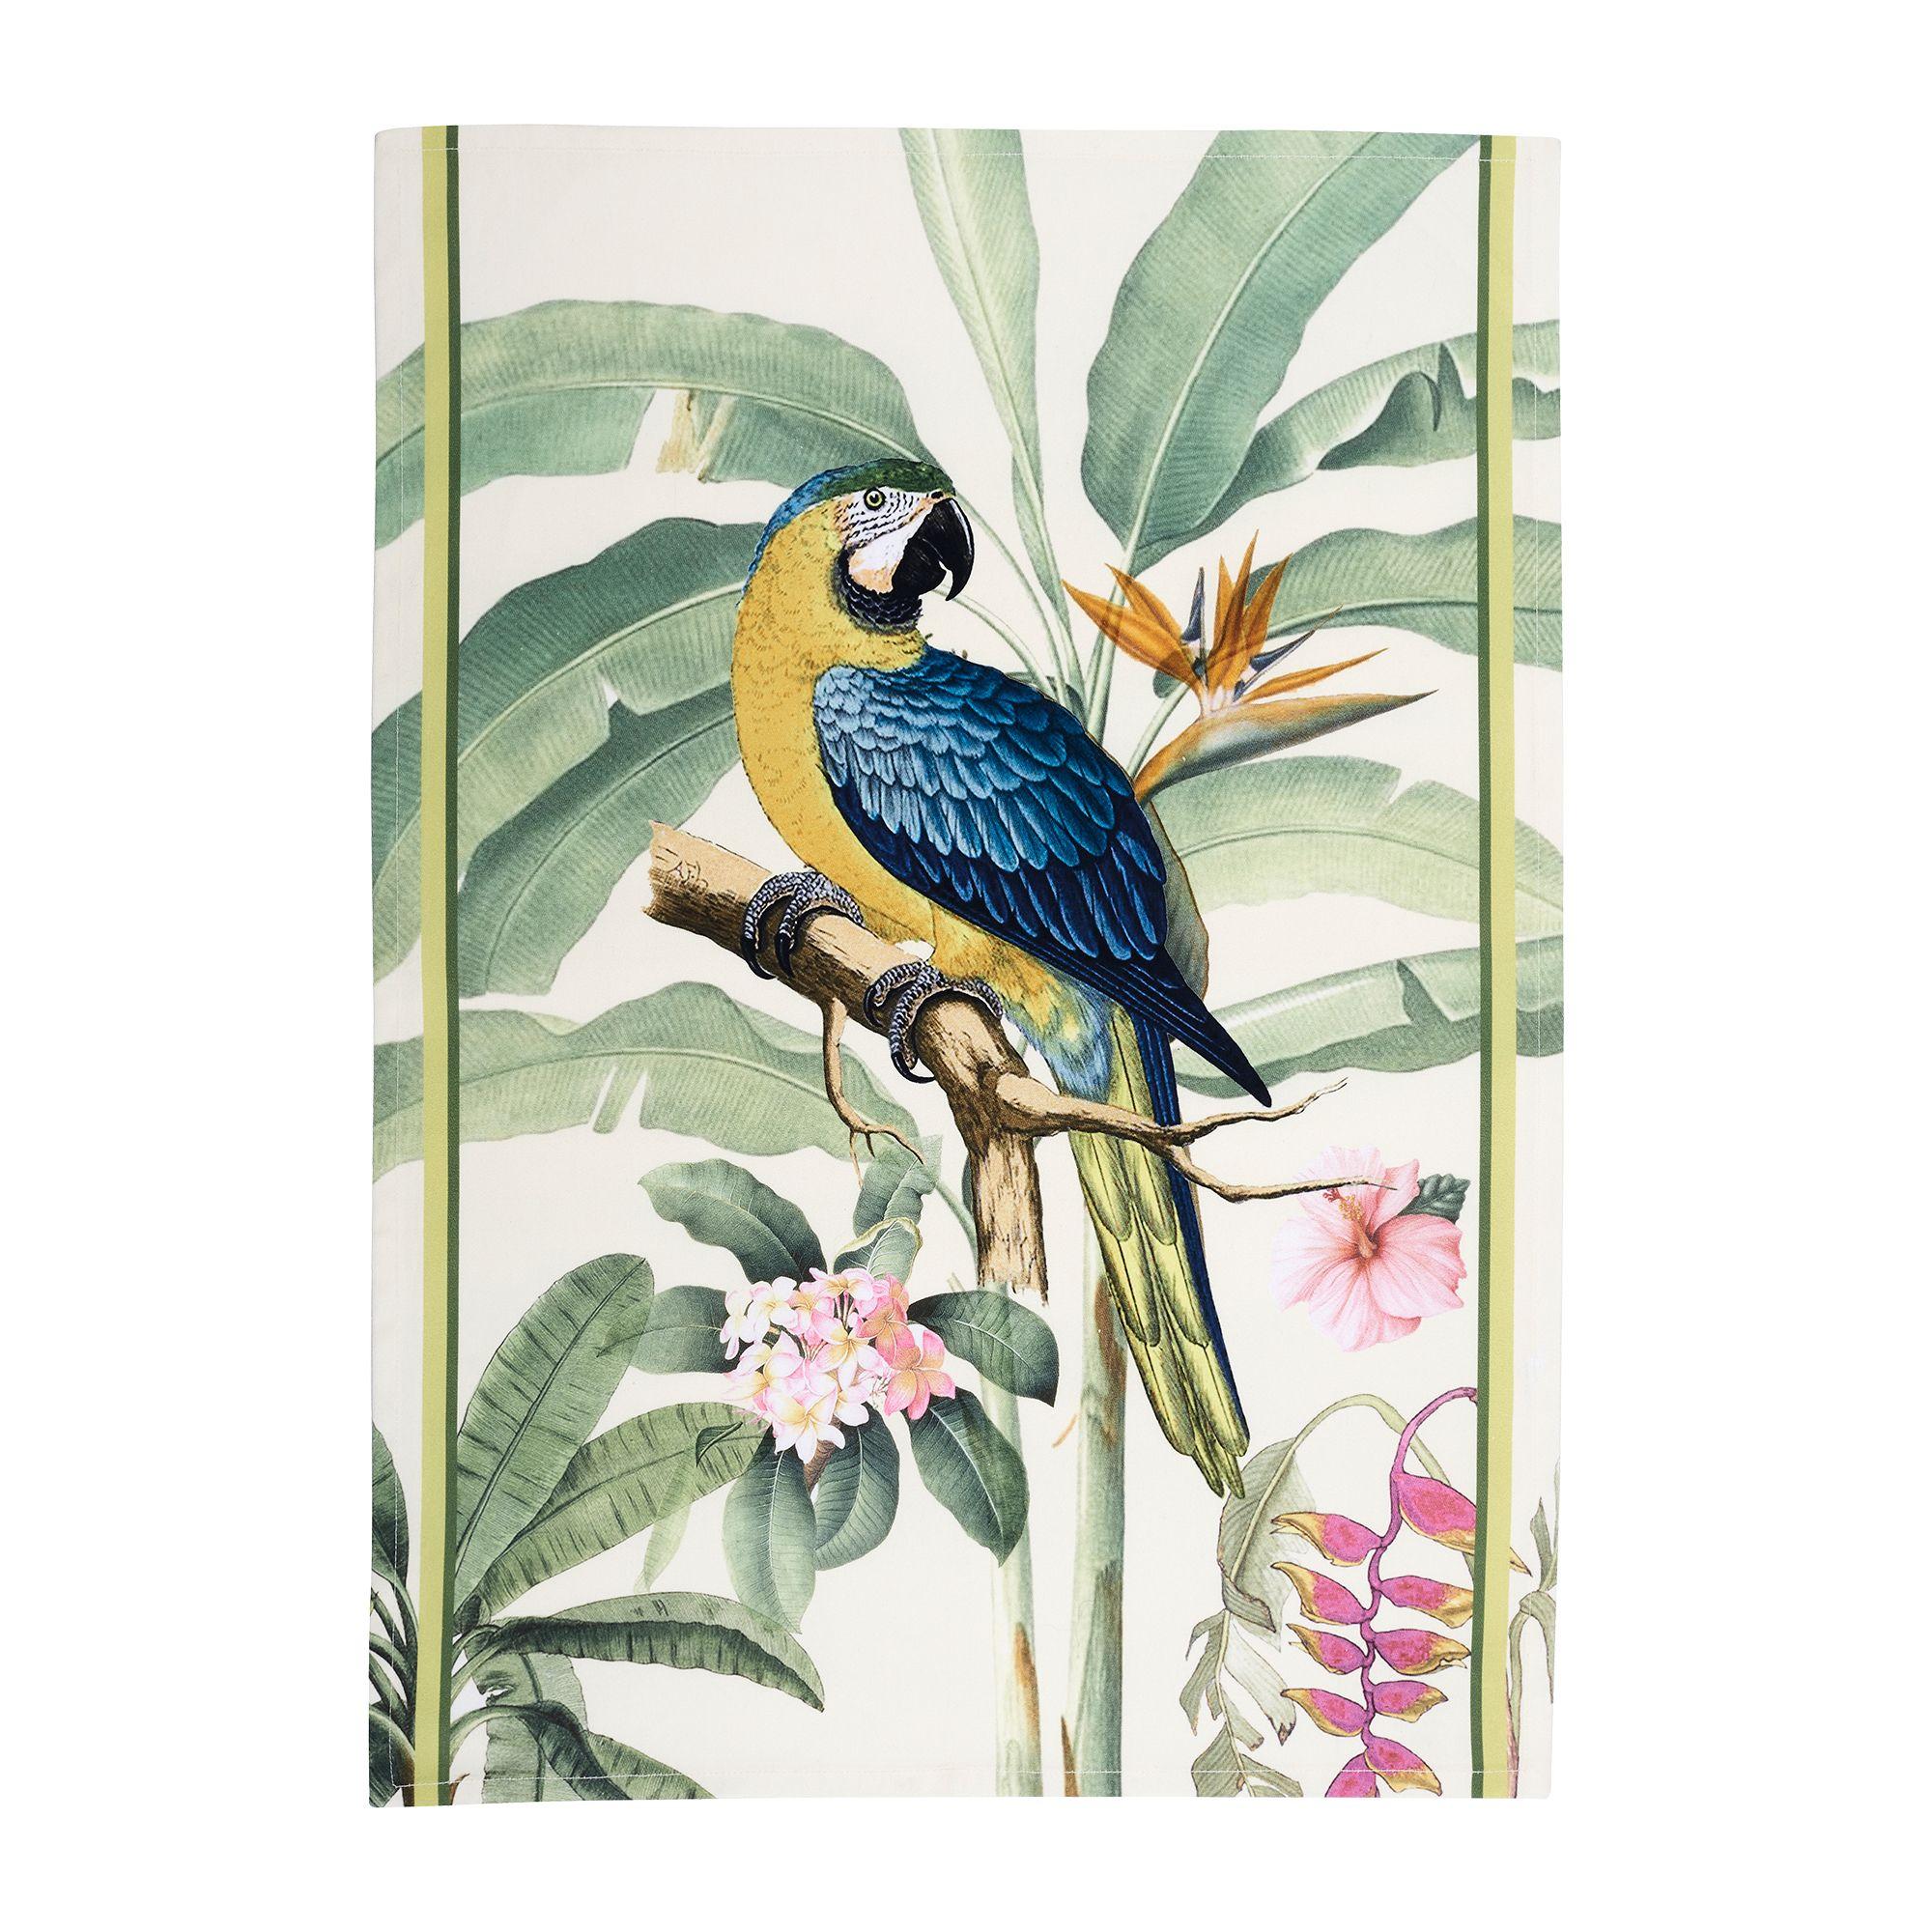 bouchara torchon parrot bouchara collection tropique exotique. Black Bedroom Furniture Sets. Home Design Ideas